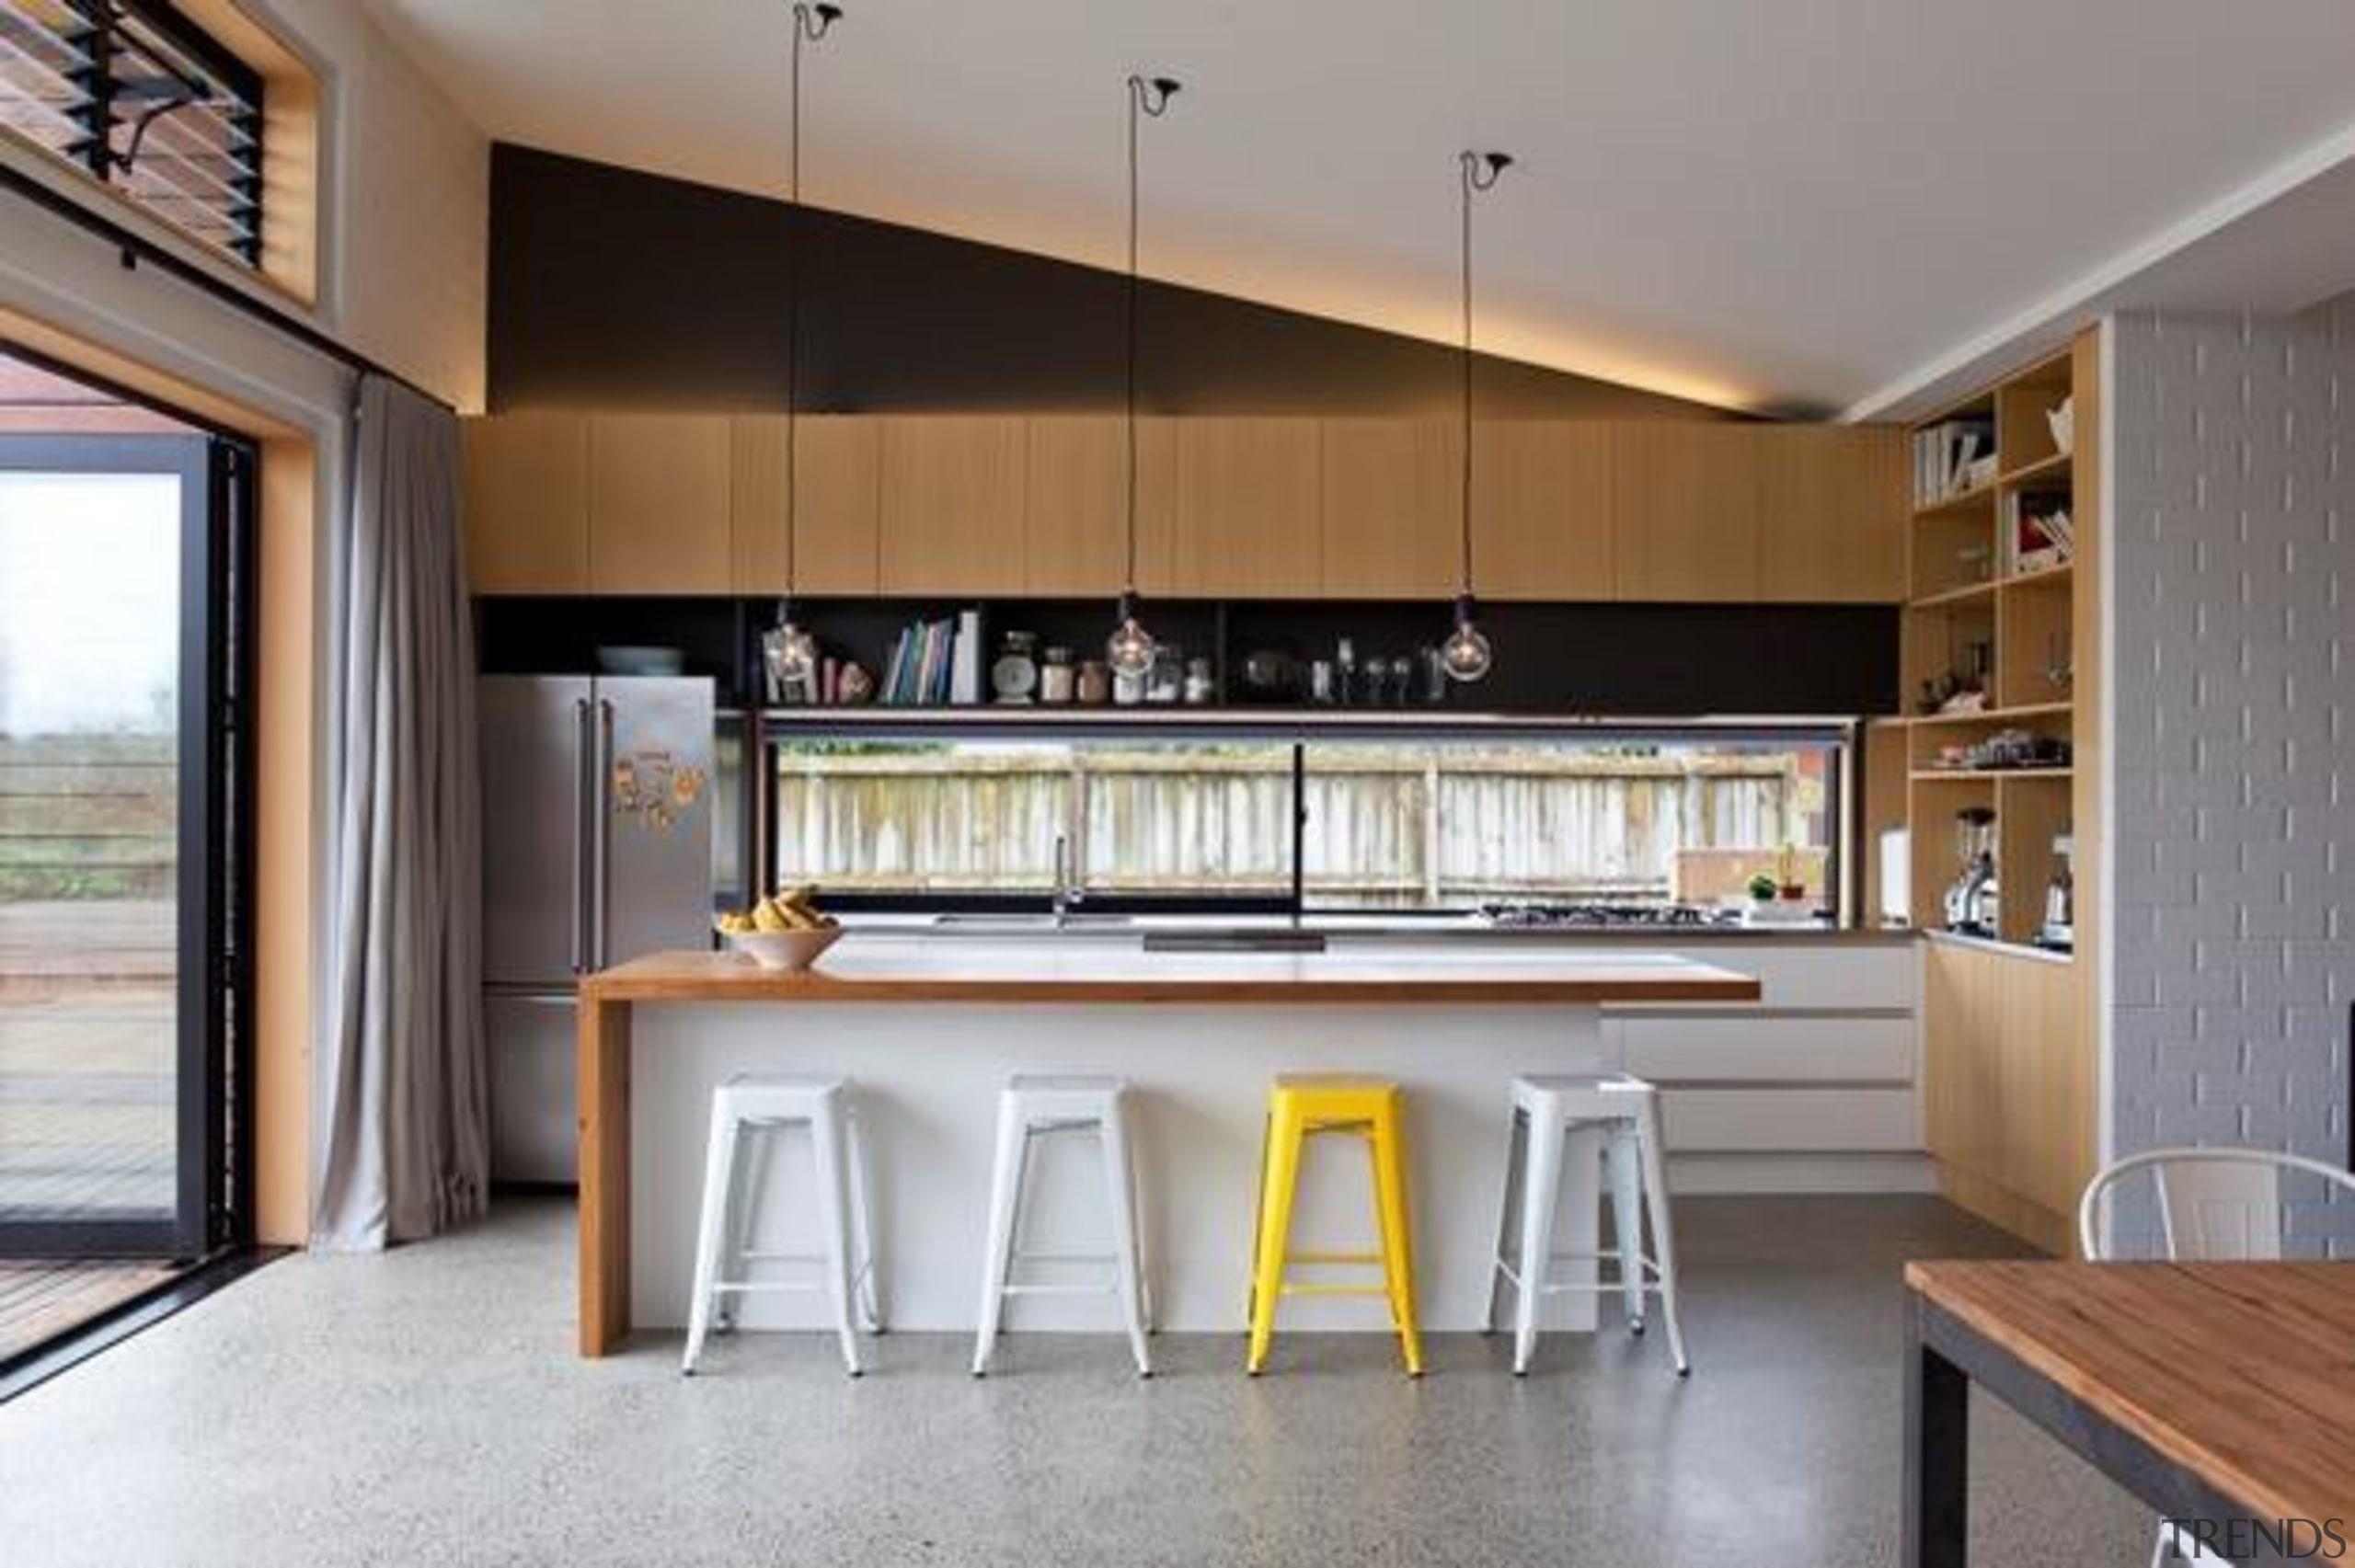 kitchen - architecture   interior design   real architecture, interior design, real estate, gray